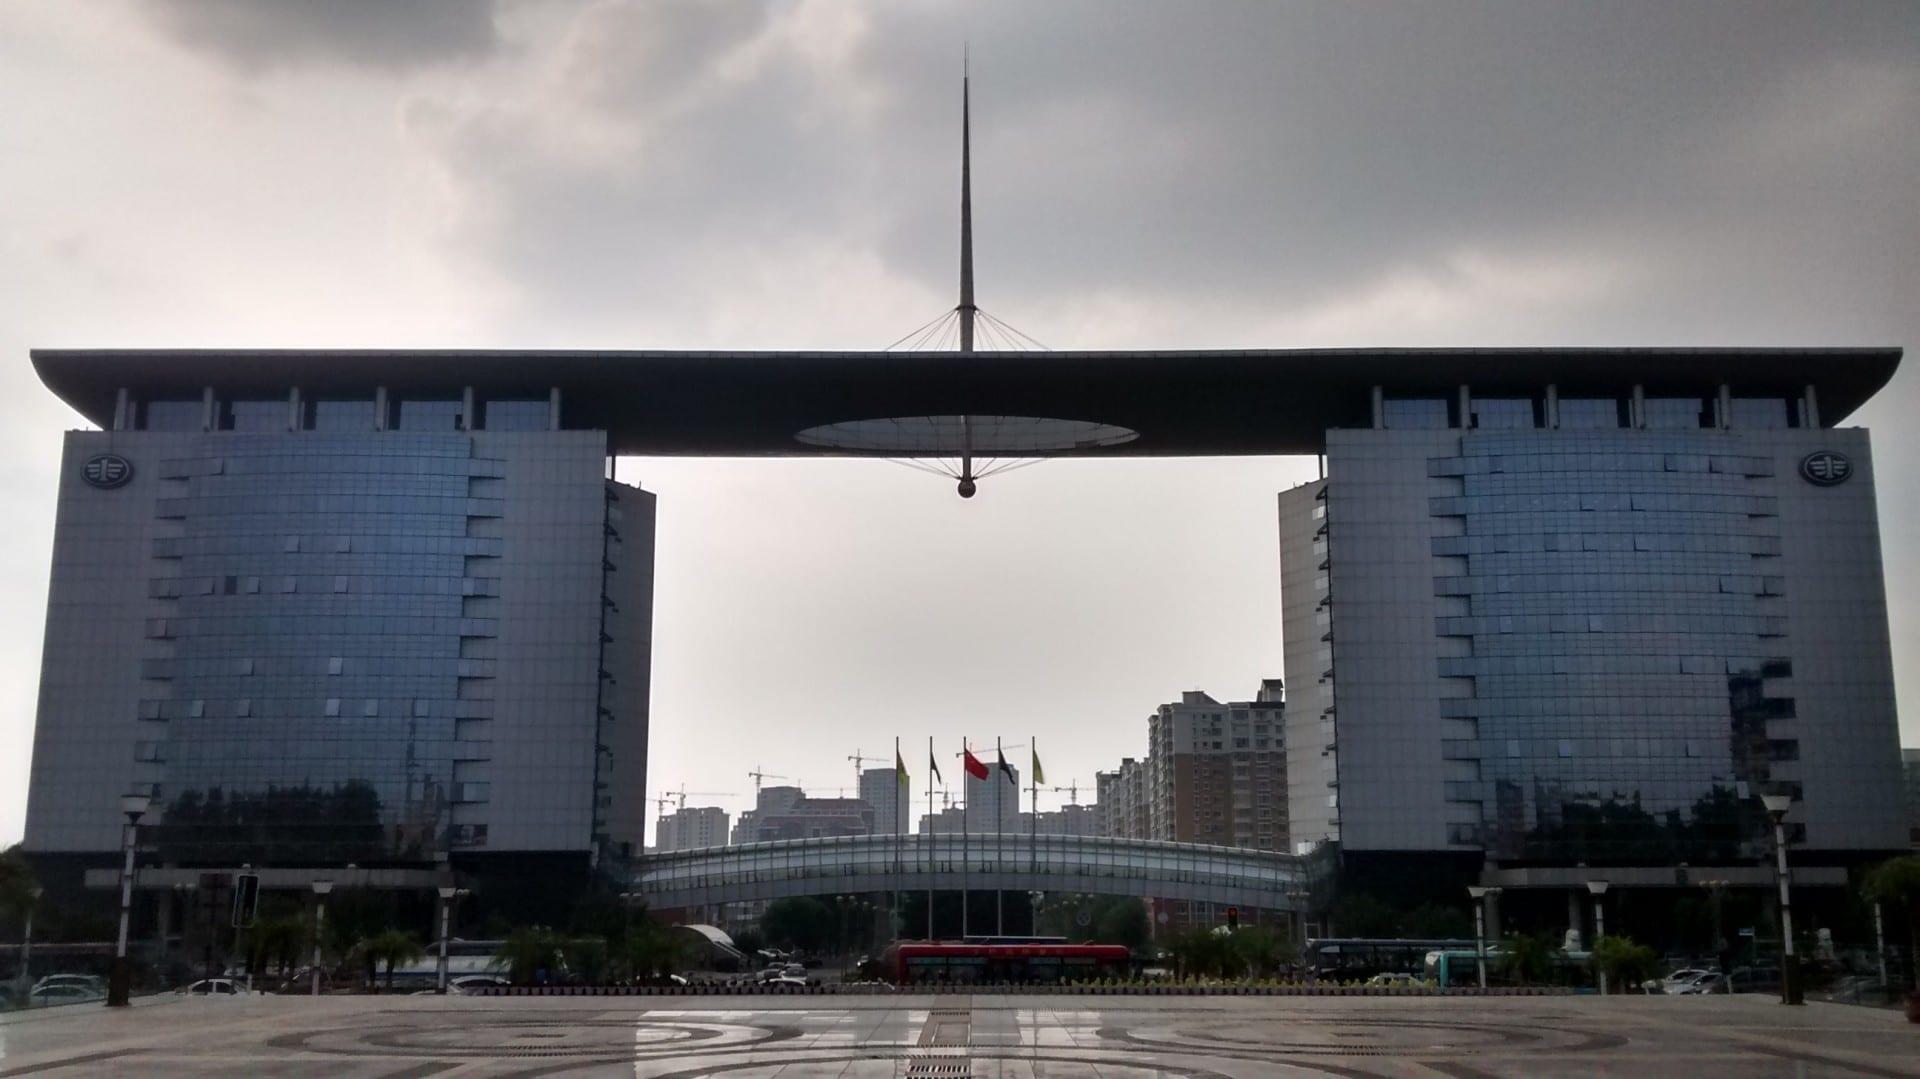 China FAW Group Corporation 中国第一汽车集团公司 edificio principal Changchun China